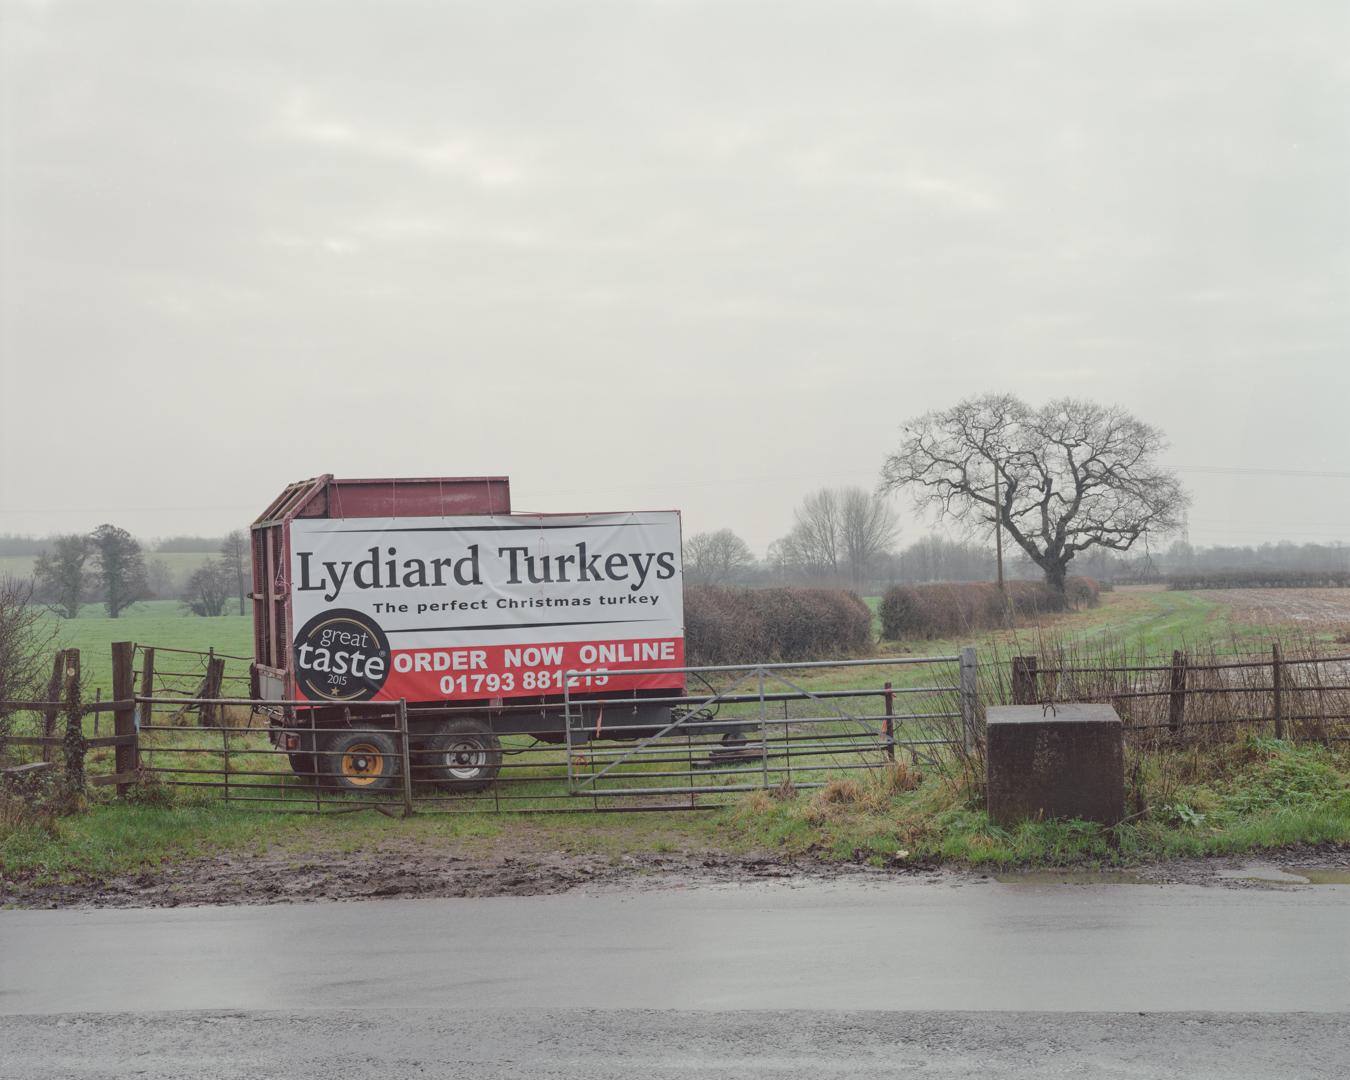 Turkey Farm, Lydiard Tregoze, 2015